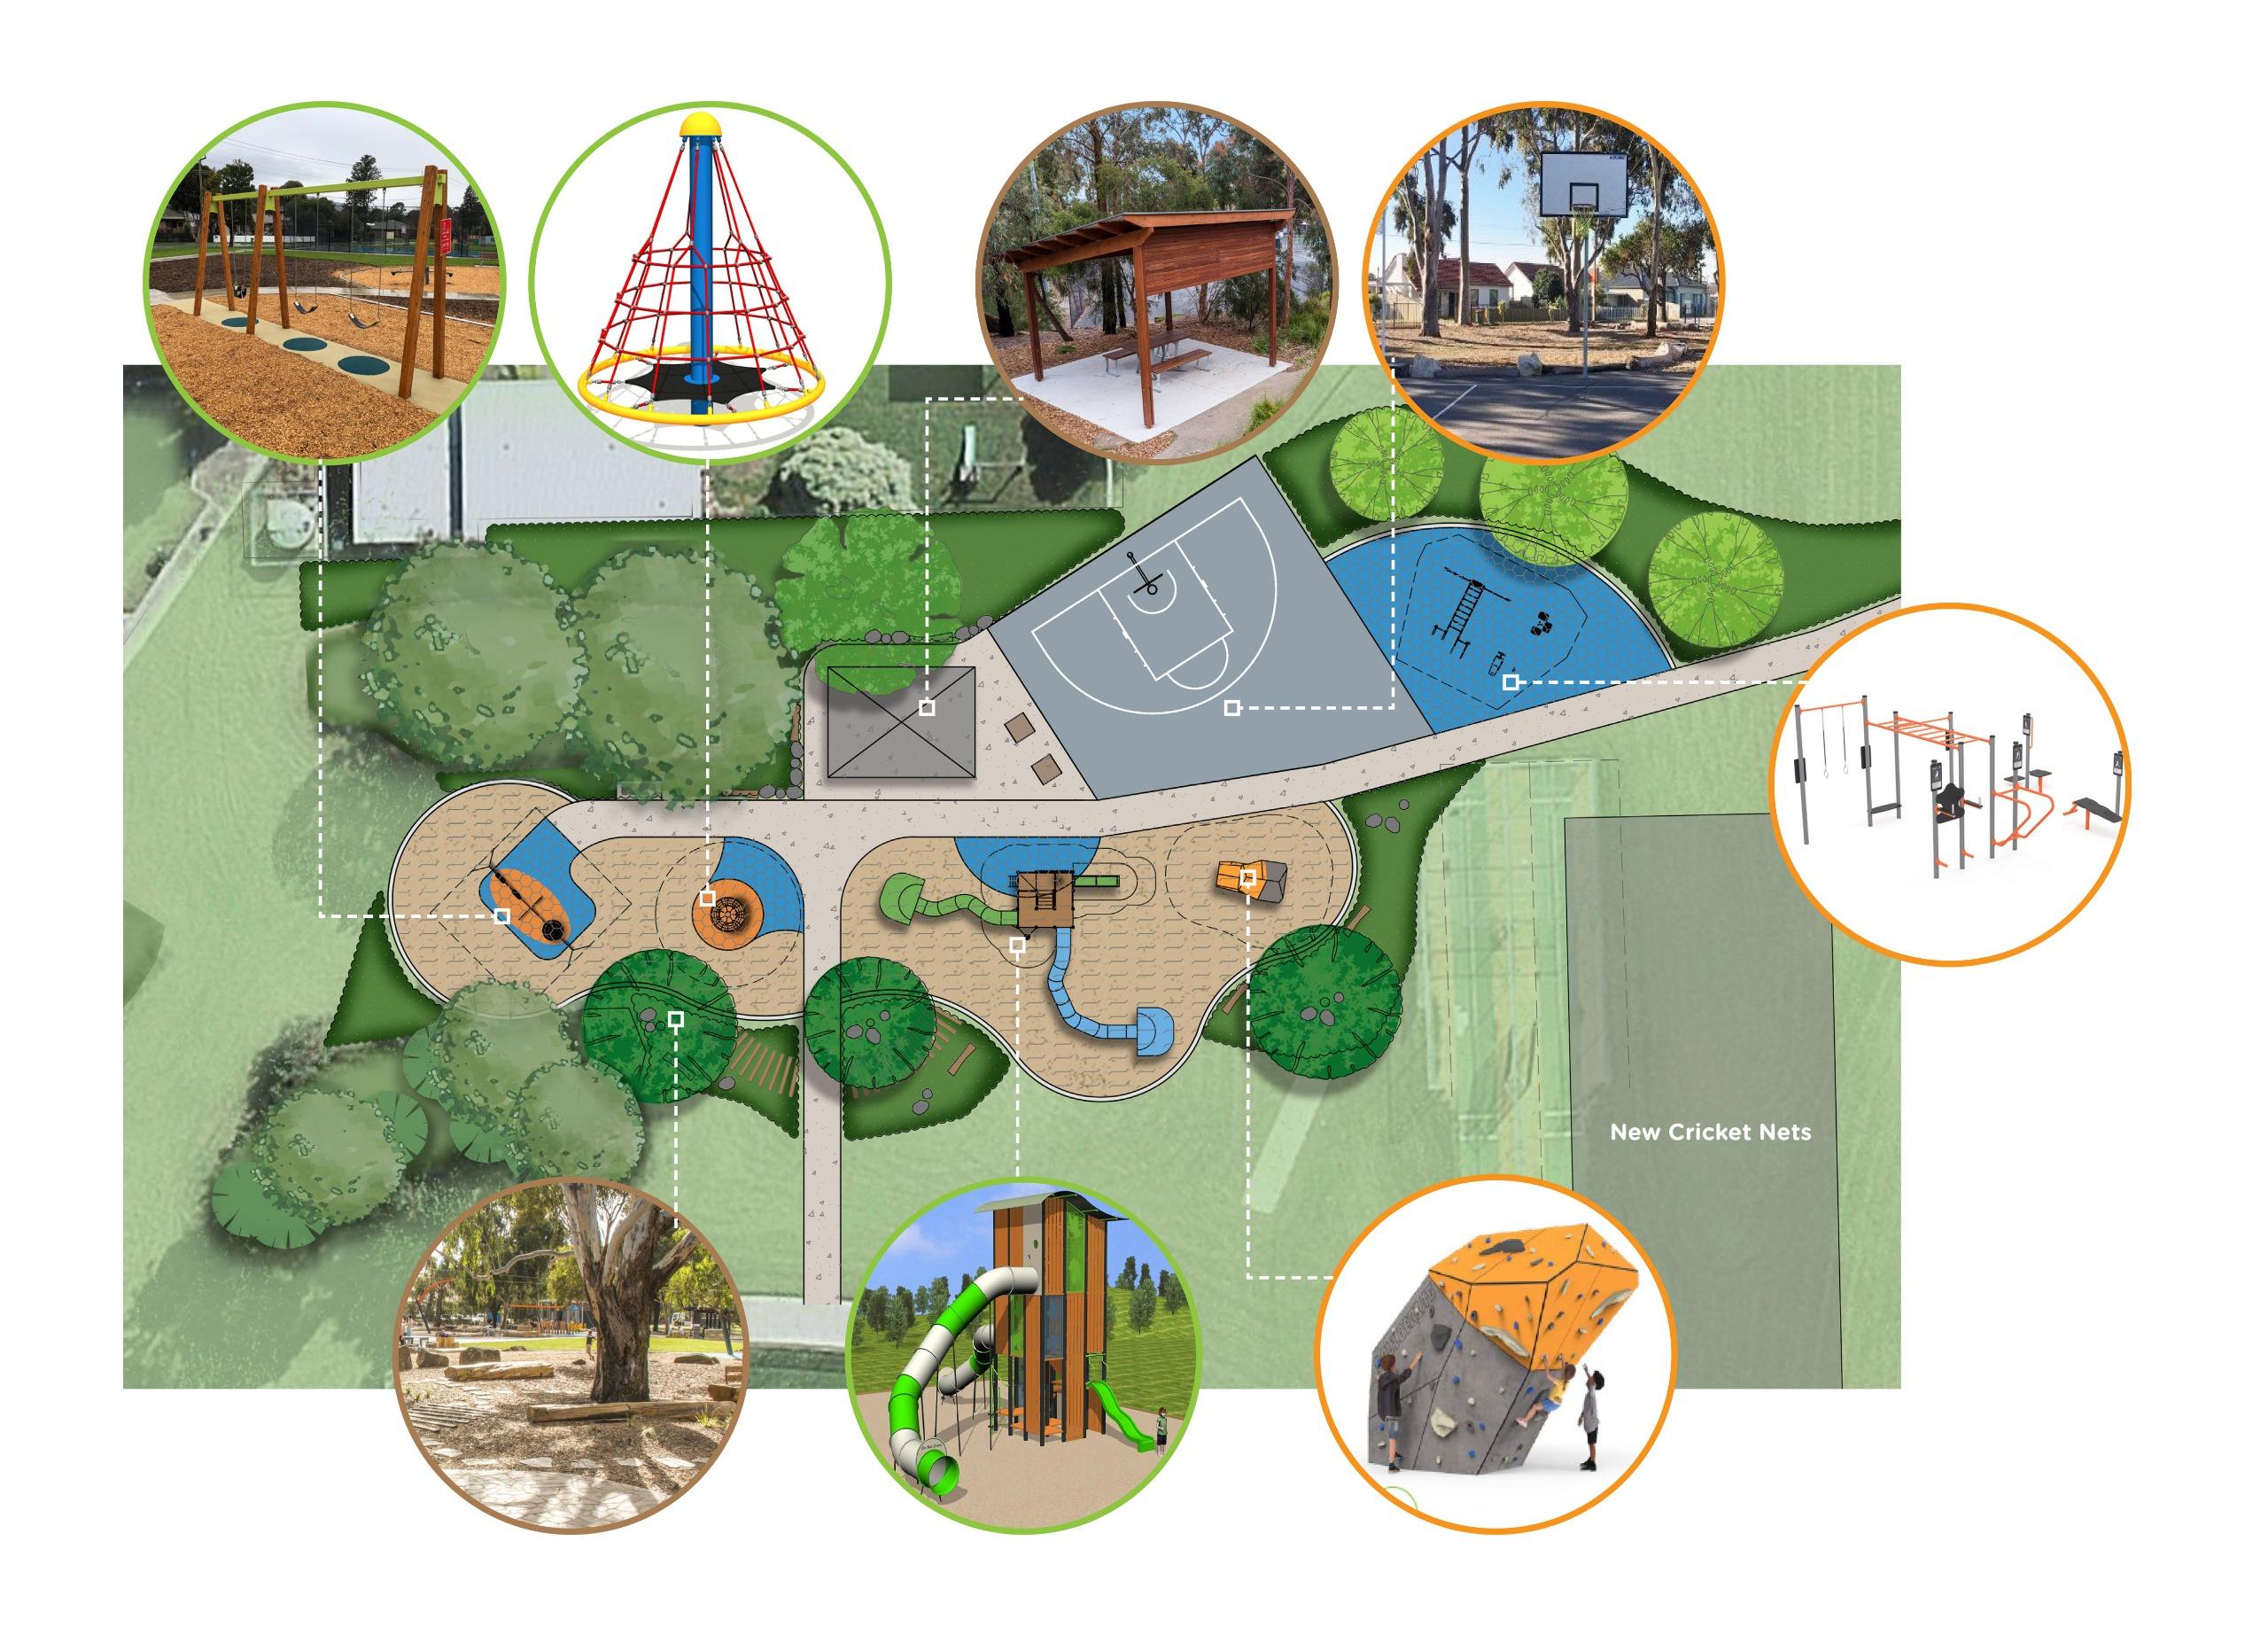 Proposed Carrington Playspace Design Plan